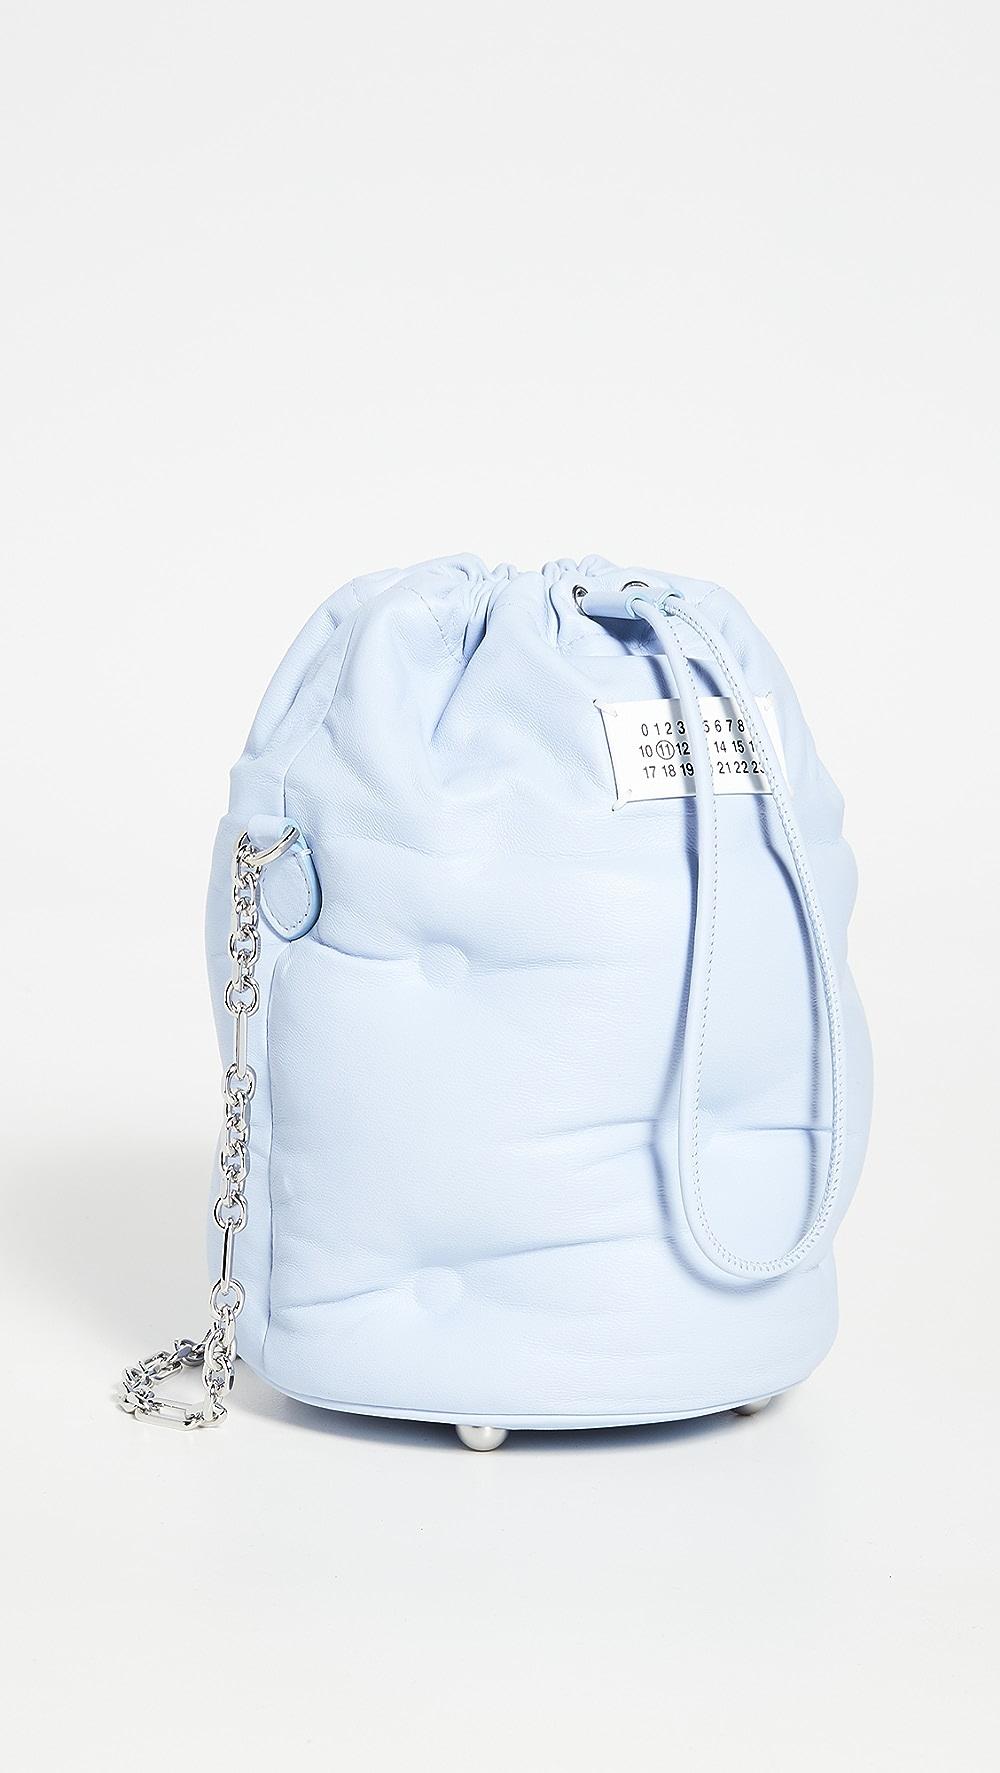 Fine Maison Margiela - Bucket Bag A Plastic Case Is Compartmentalized For Safe Storage